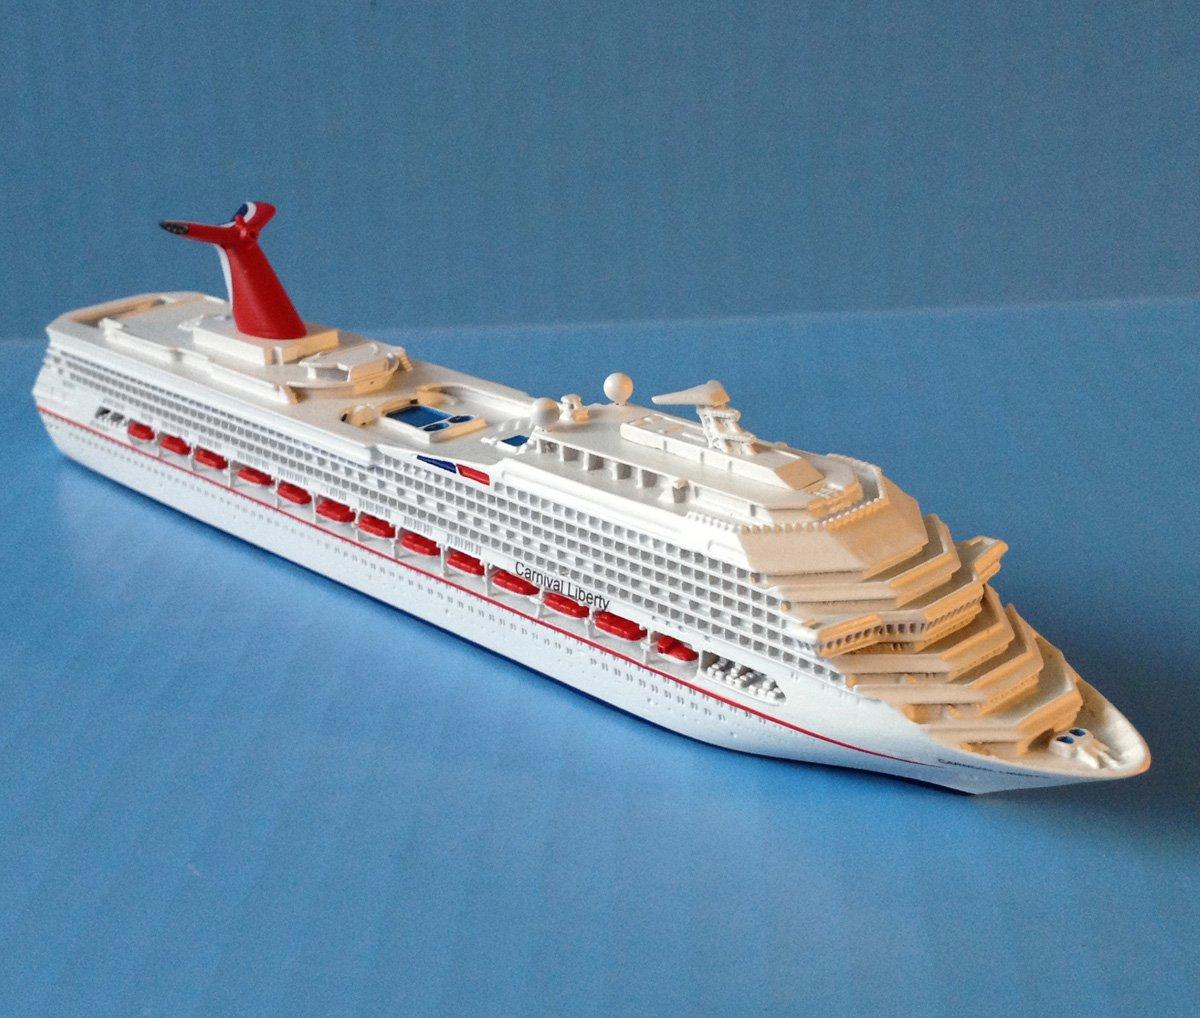 Amazoncom CARNIVAL LIBERTY Cruise Ship Model In Scale - Remote control cruise ship